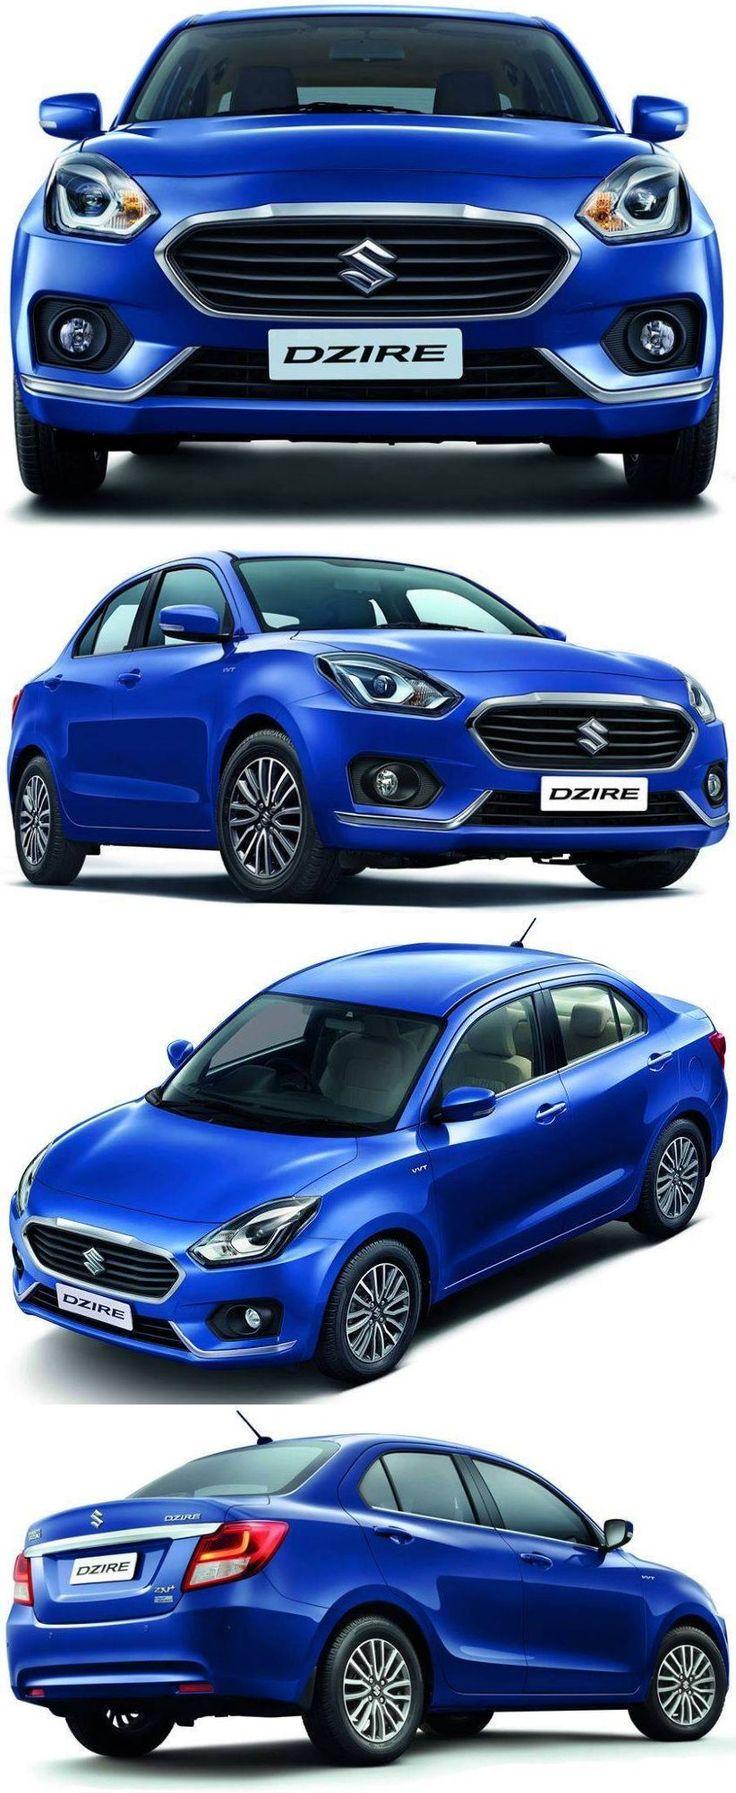 16 studio quality pictures of india s latest compact sedan